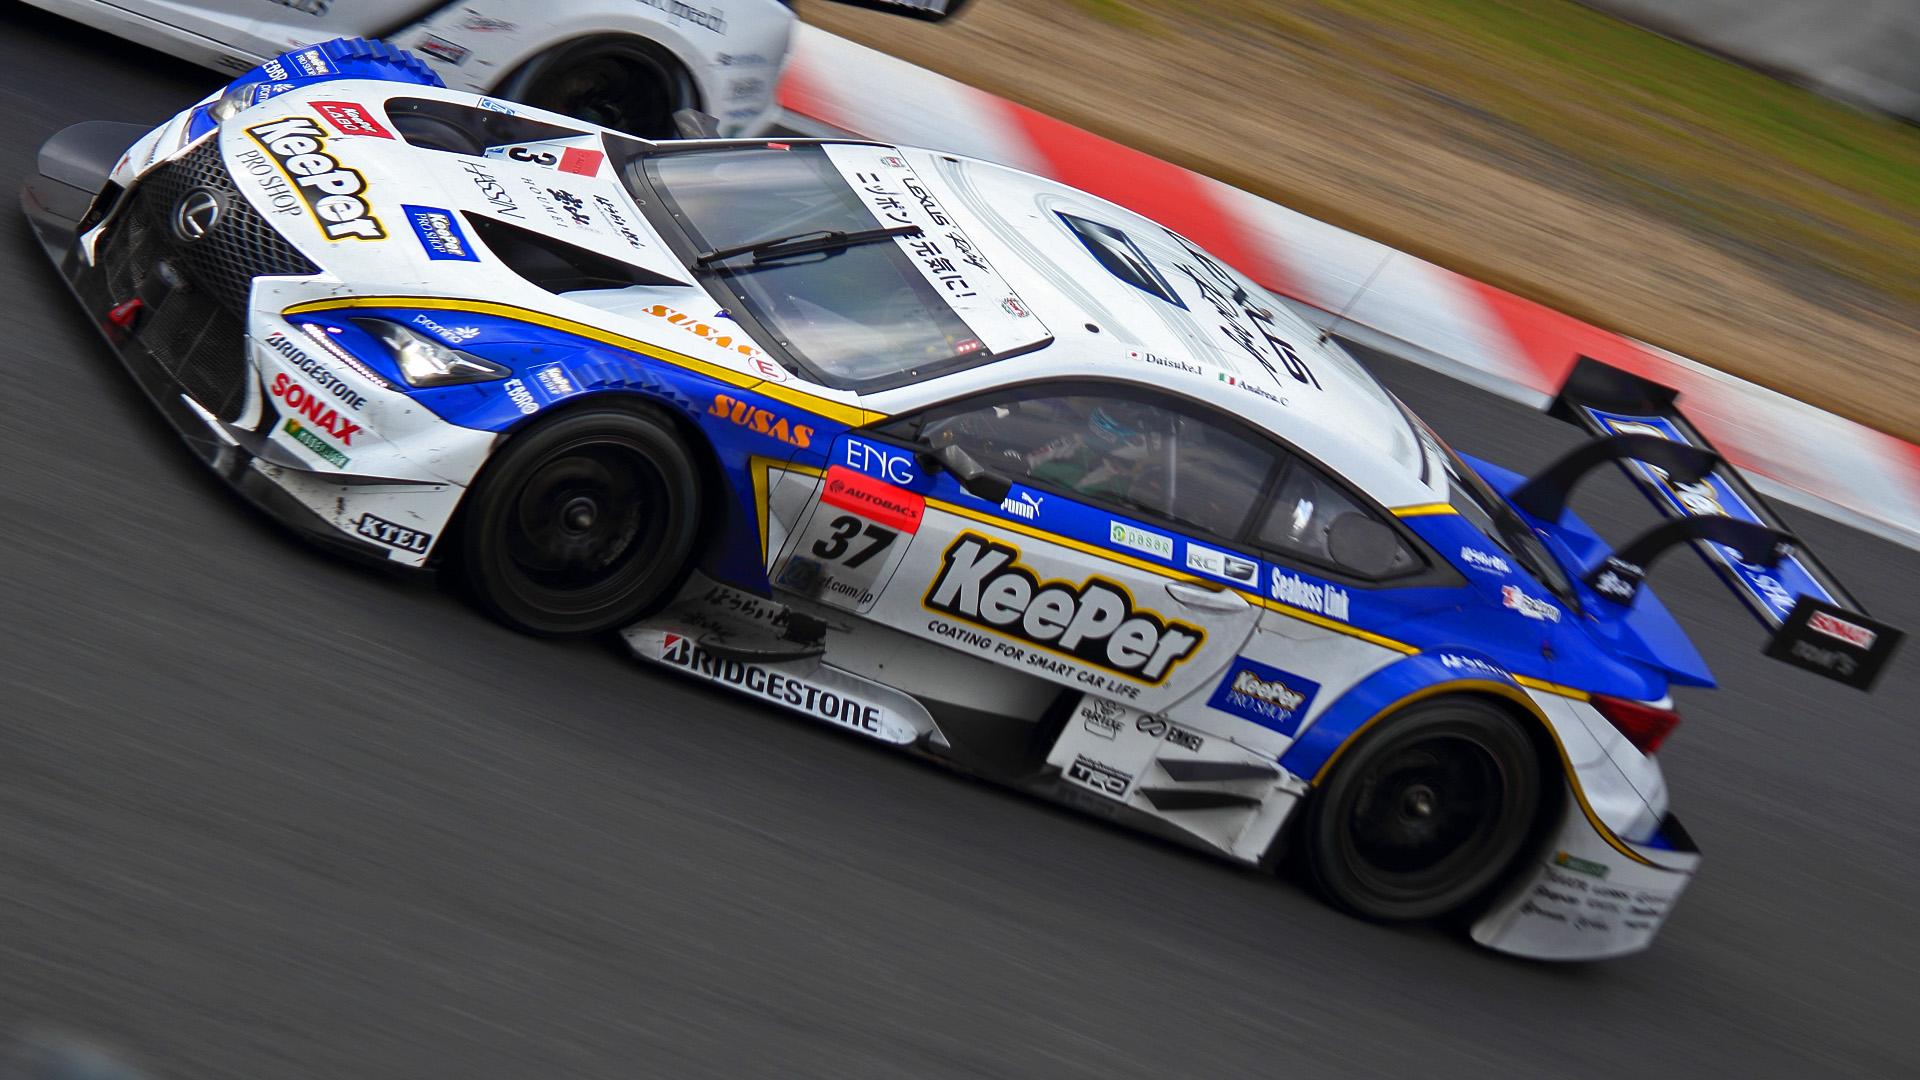 Super Gt 開幕戦 Okayama Gt 300km Race:フォトギャラリー Challenging